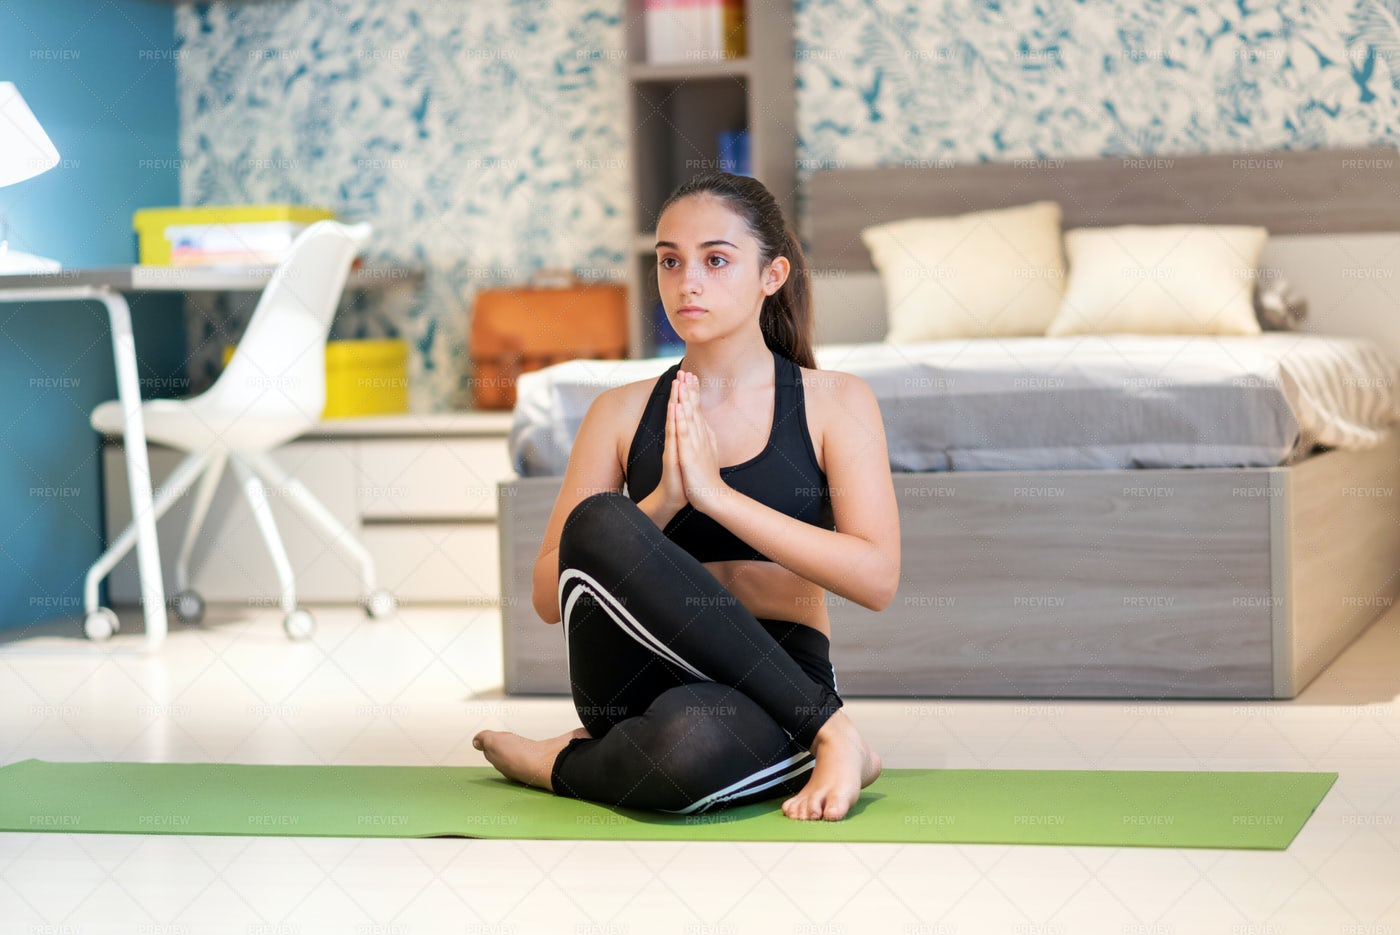 Focused Teen Practicing Yoga: Stock Photos